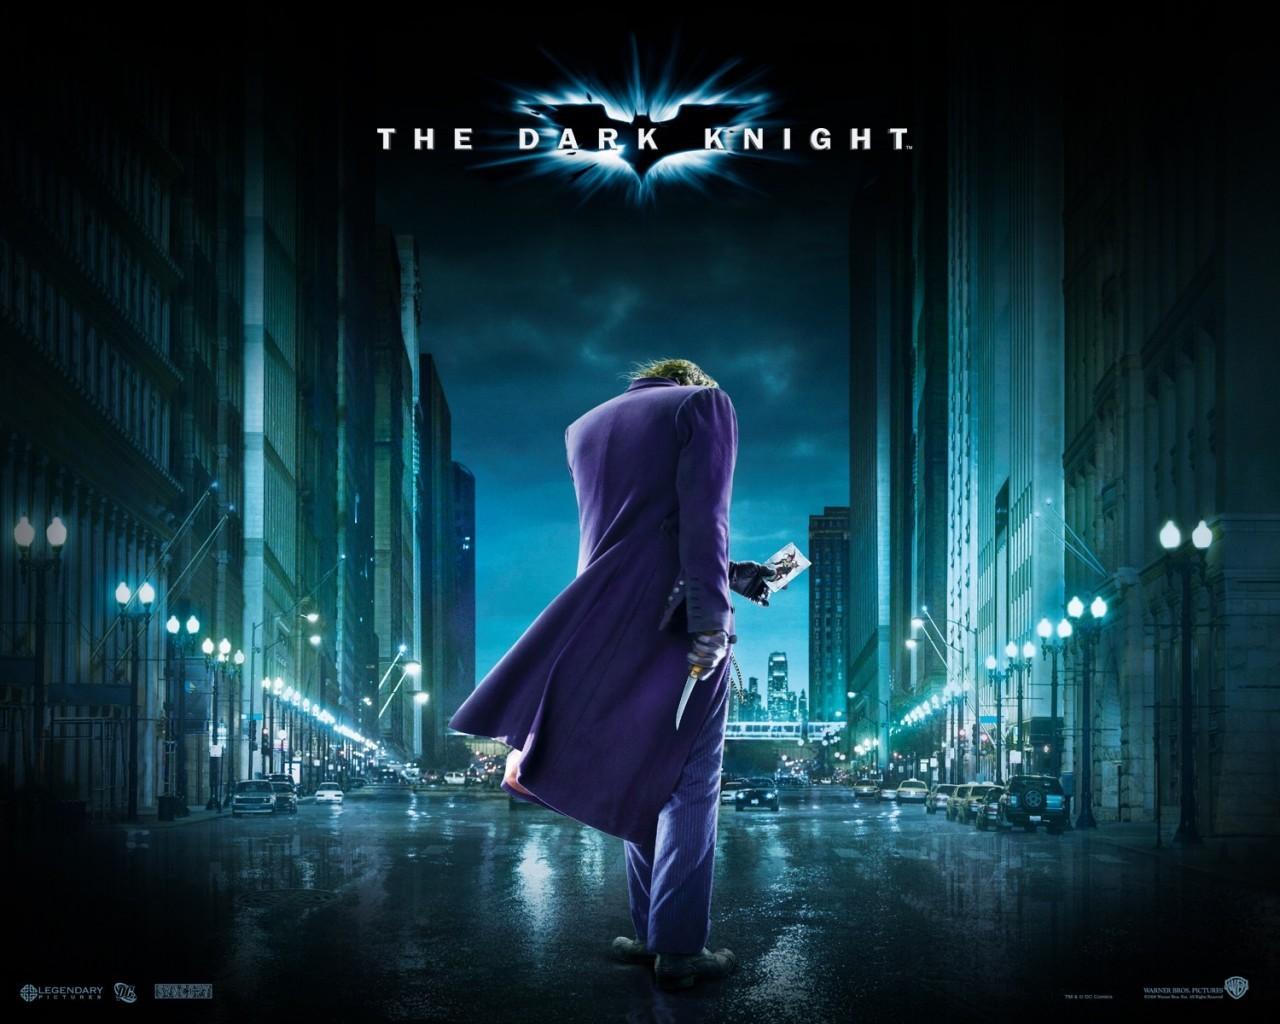 Download mobile wallpaper Joker, Batman, Cinema, People for free.